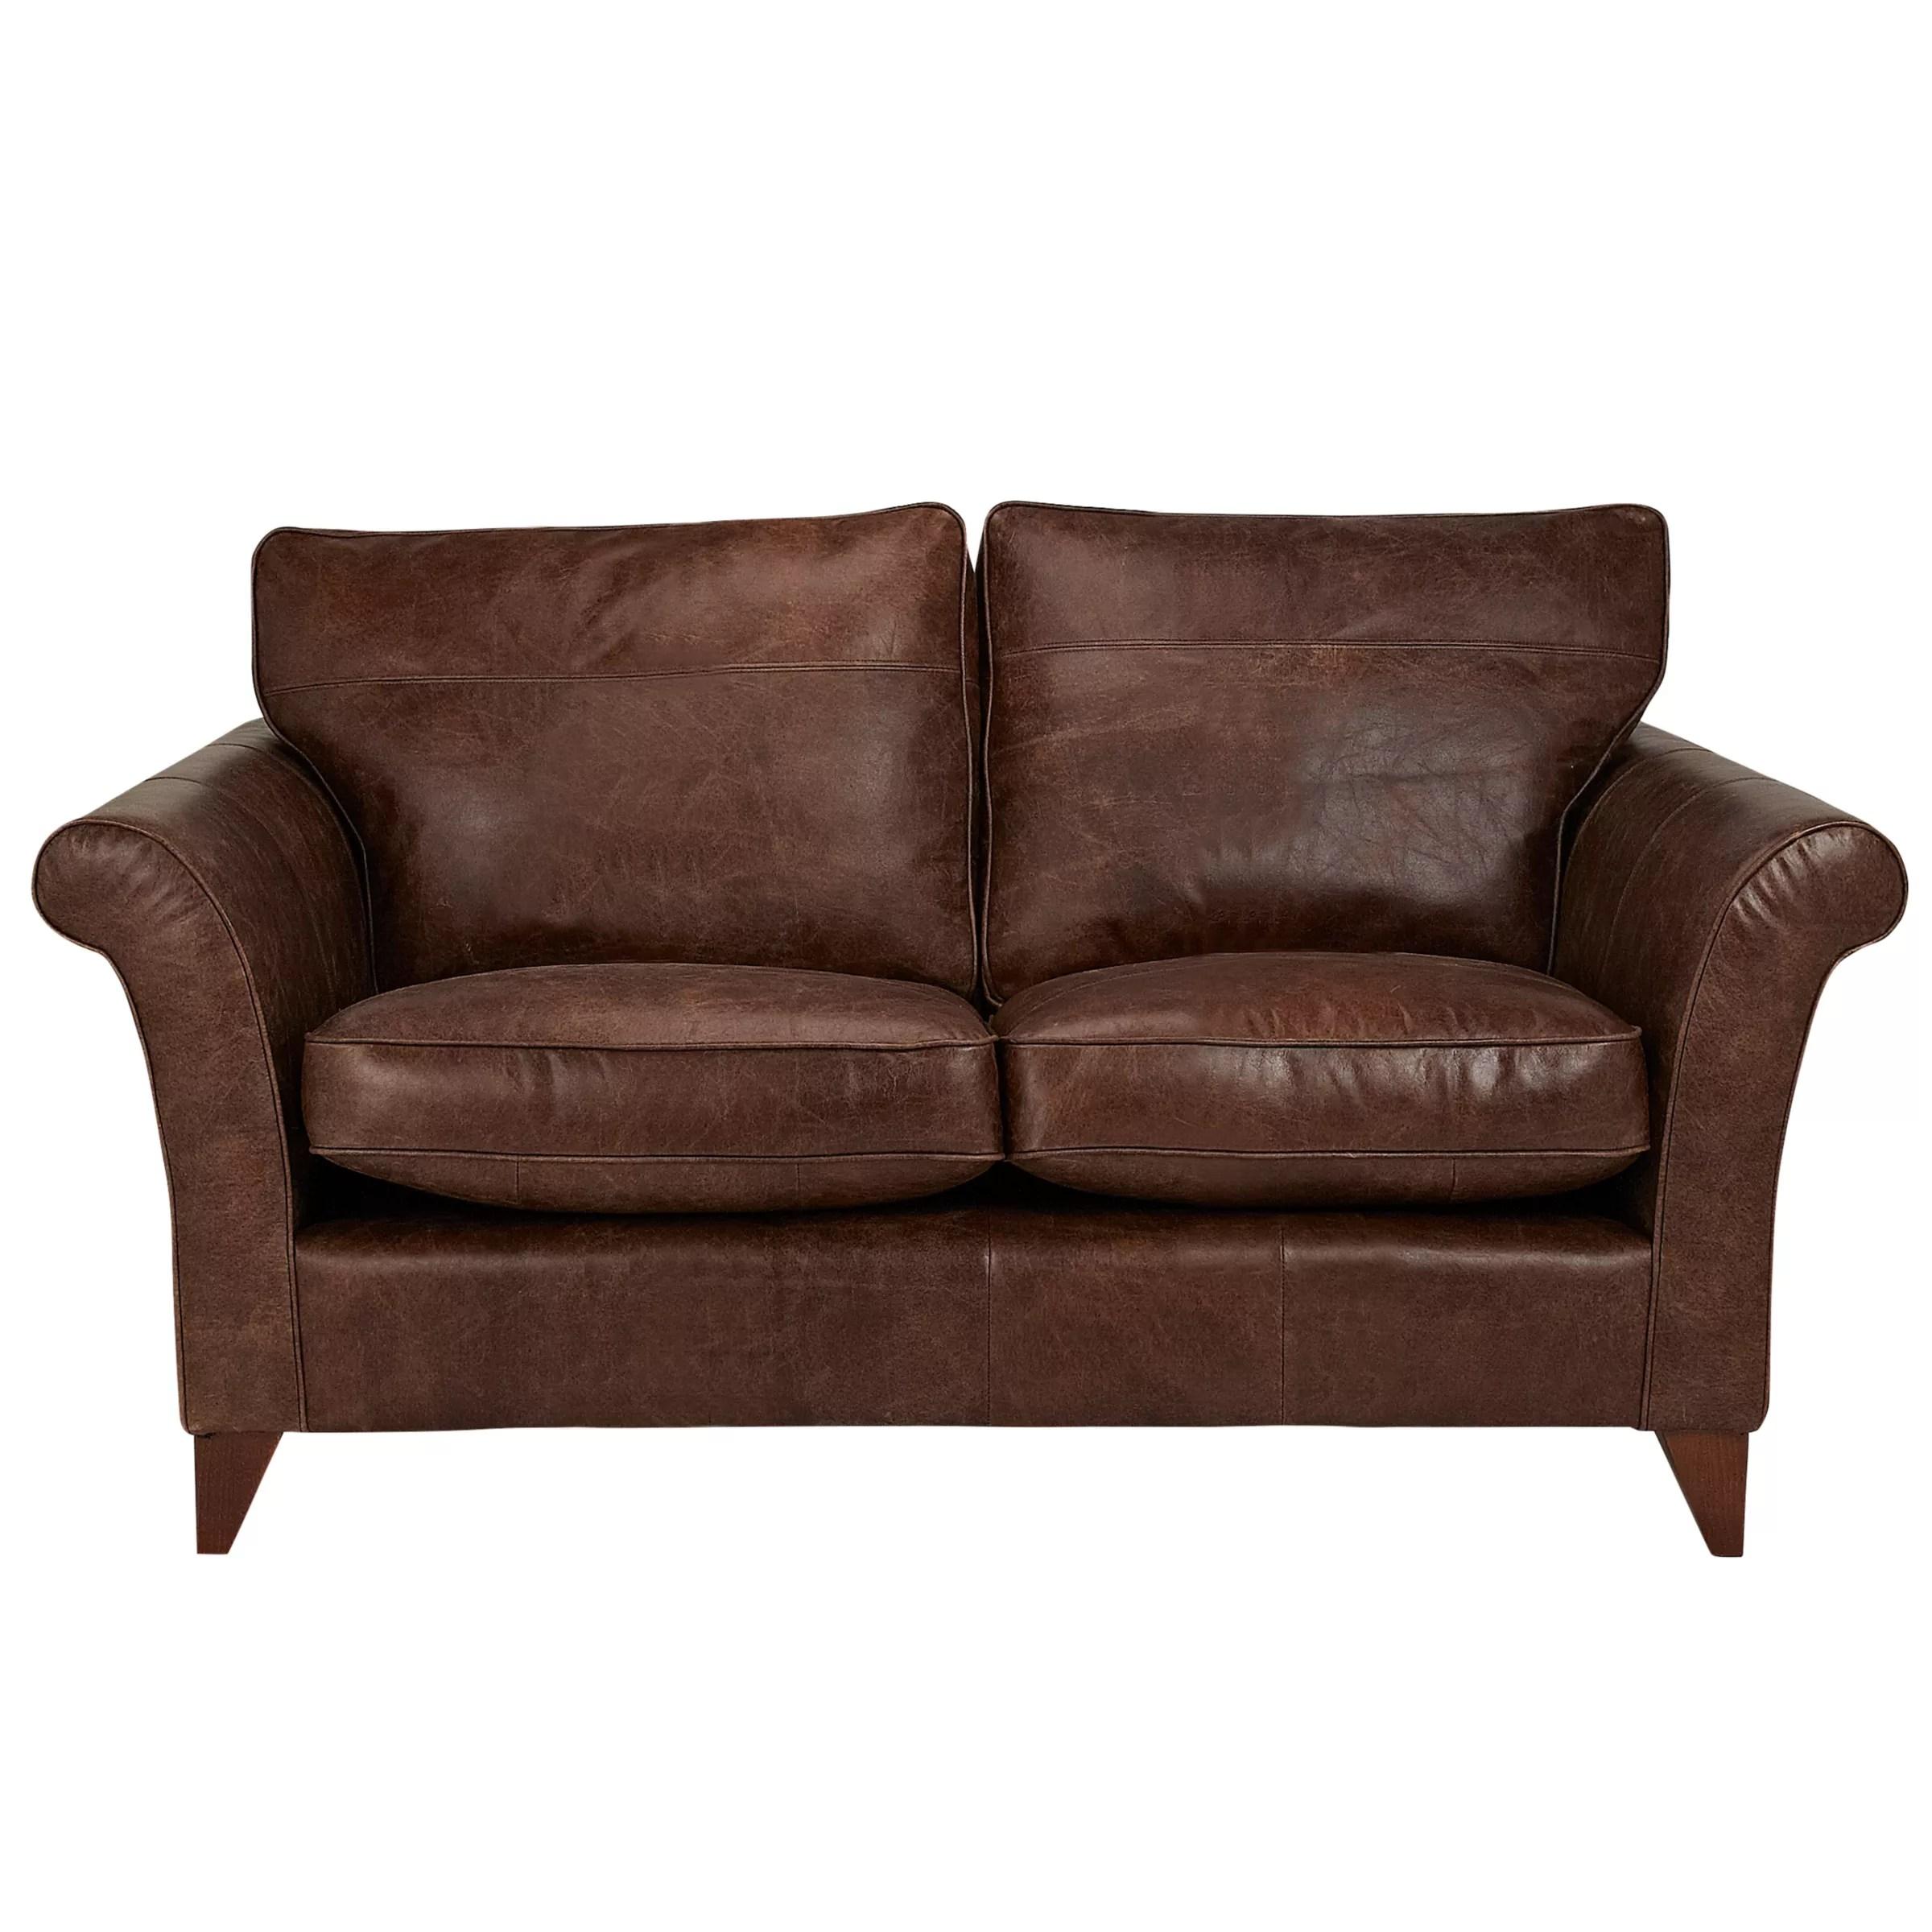 rialto sofa bed air india john lewis charlotte medium leather bruno at buyjohn online johnlewis com